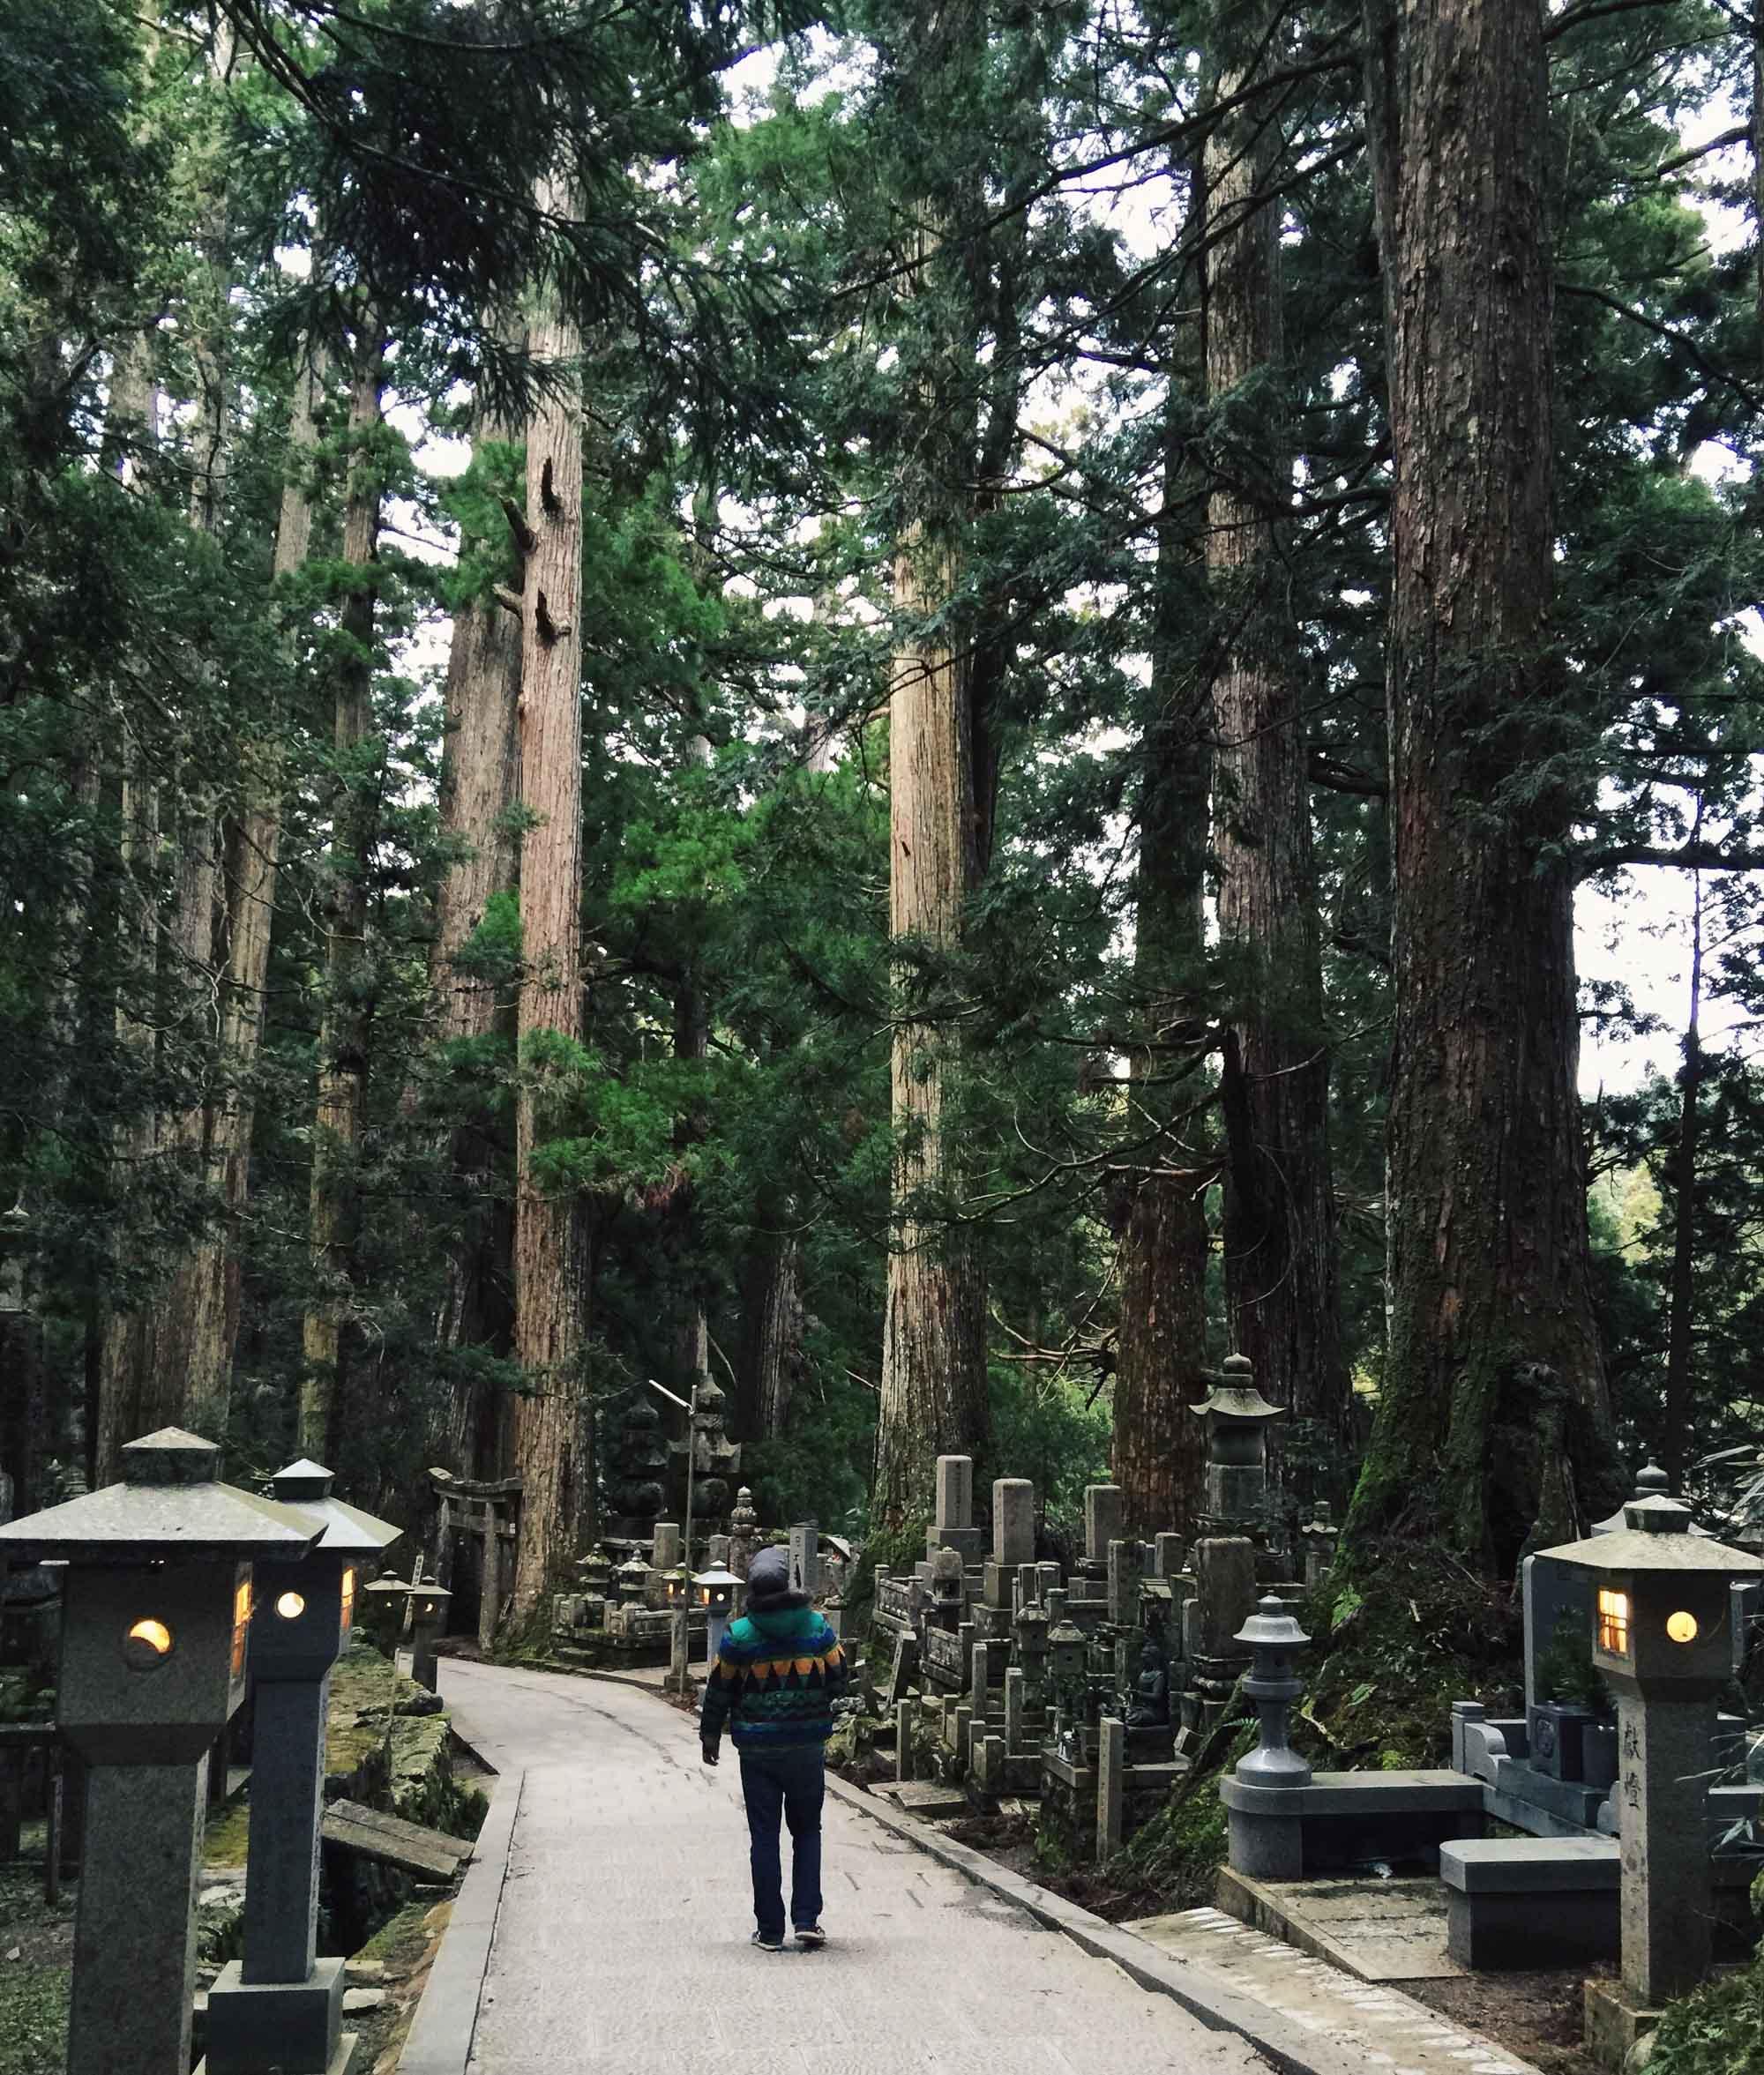 Instagramming Japan - Koyasan cemetery